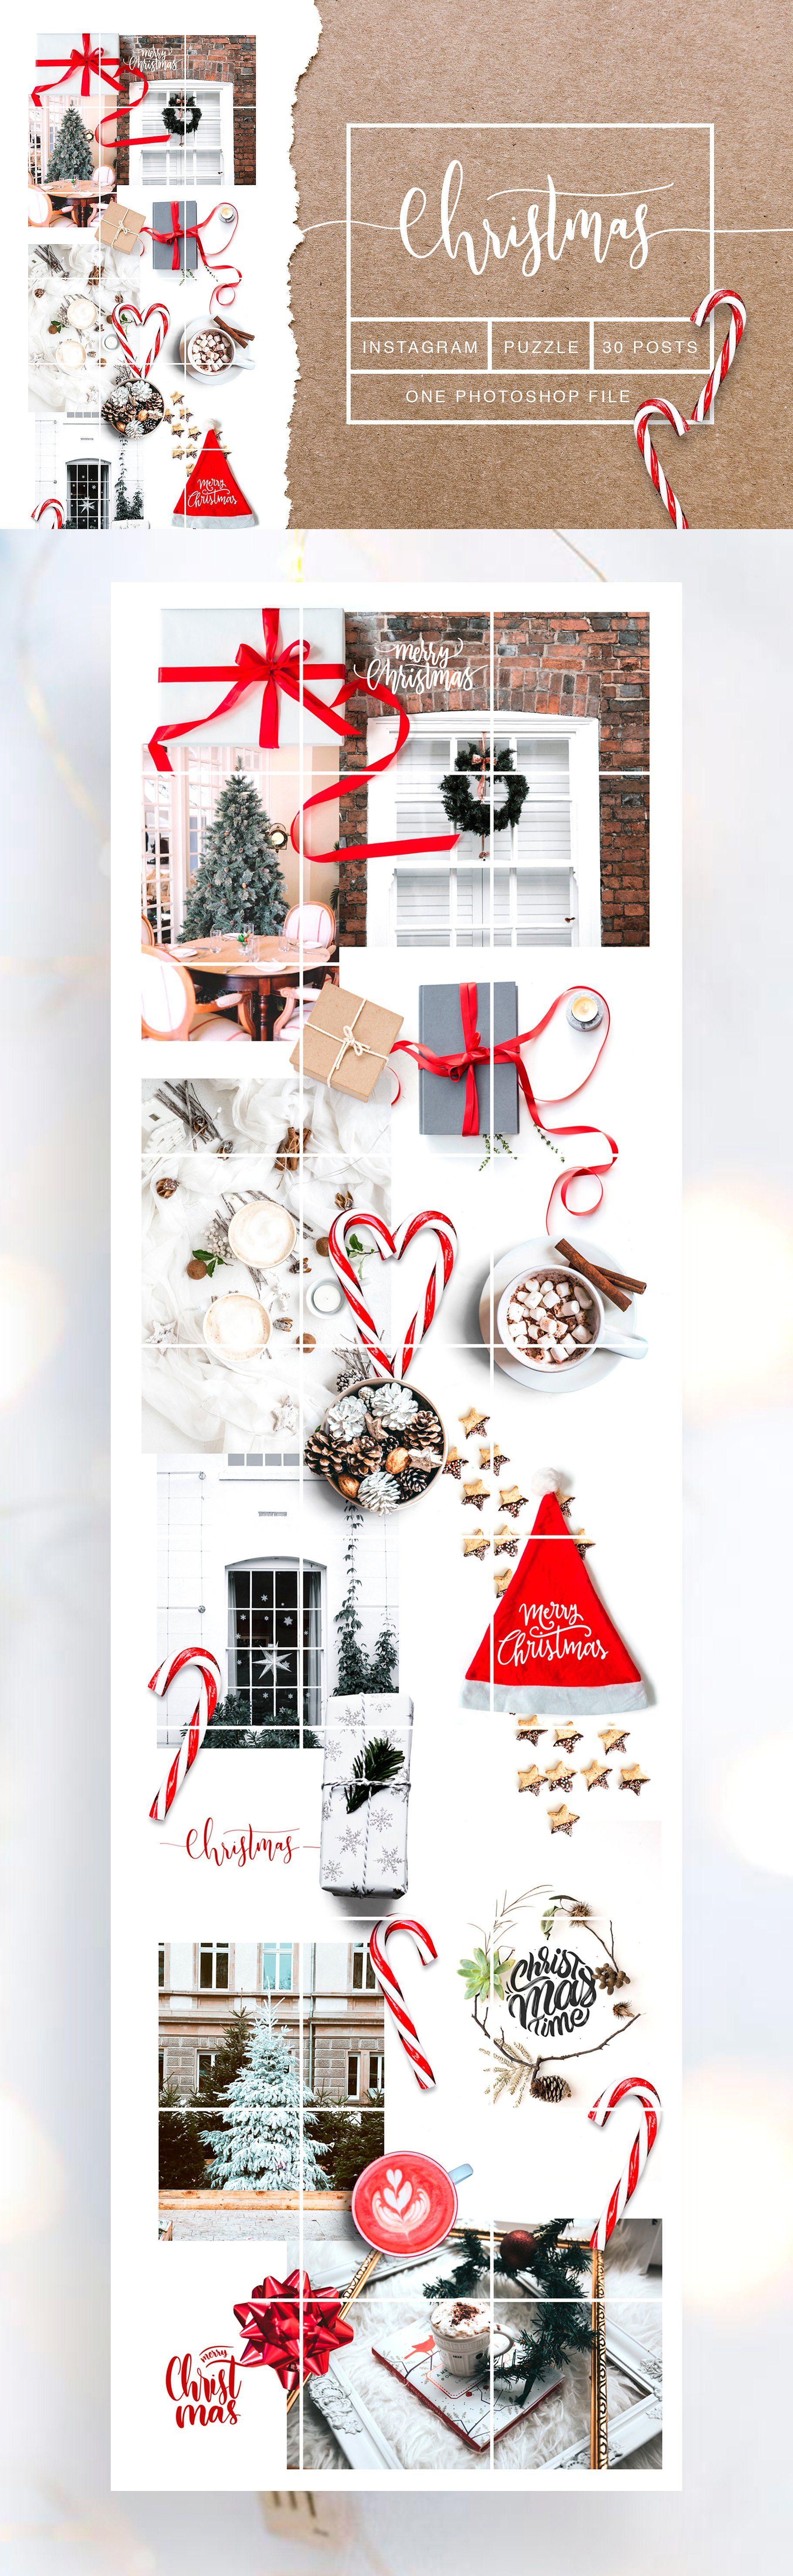 Christmas Insta Puzzle Psd Canva Instagram Diy Website Instagram Template